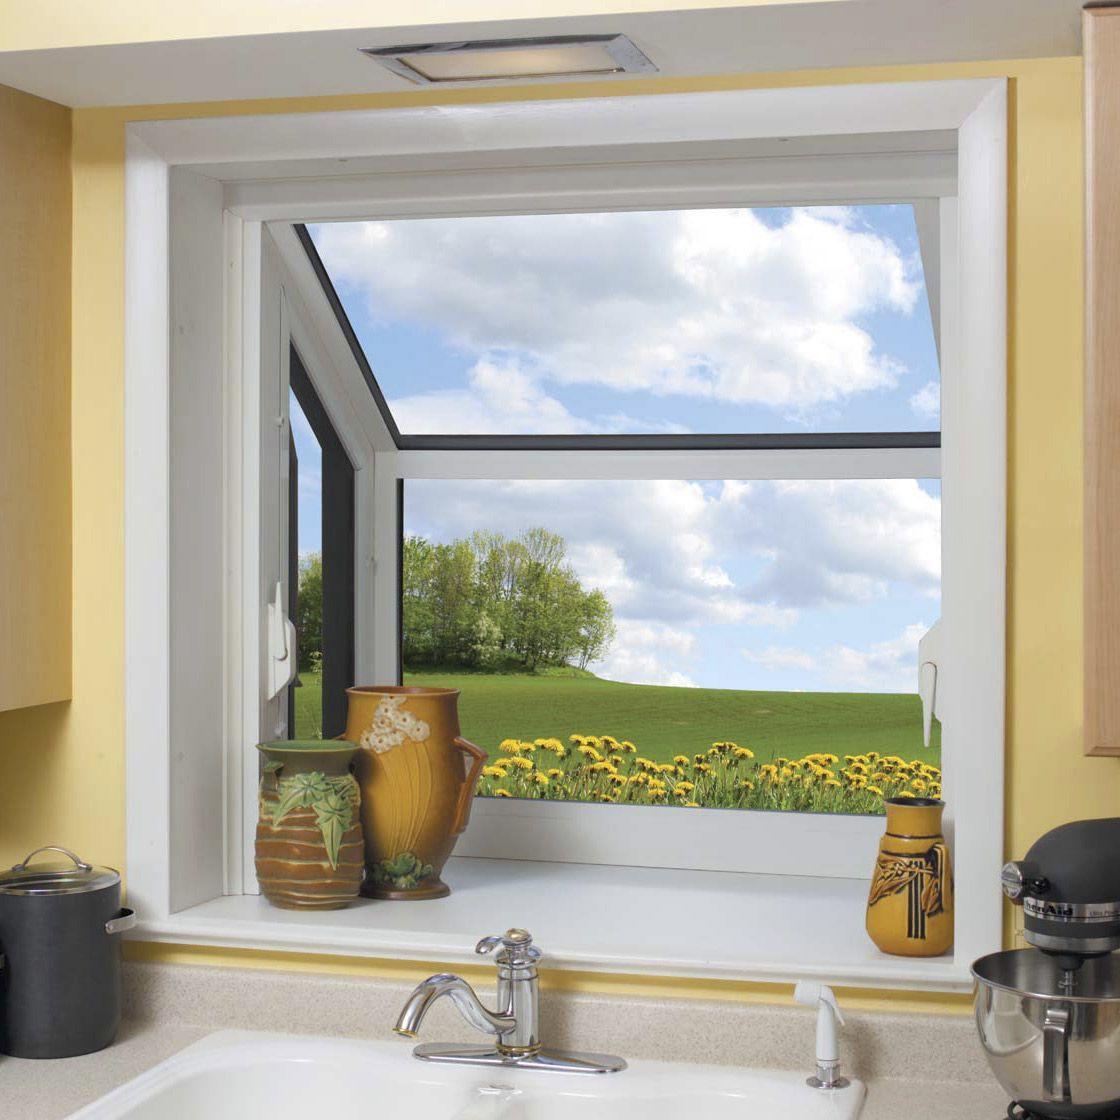 A Kitchen Window Full Of Herbs Is A Must Thehealingwalk Com Herb Garden In Kitchen Indoor Gardens Home And Garden